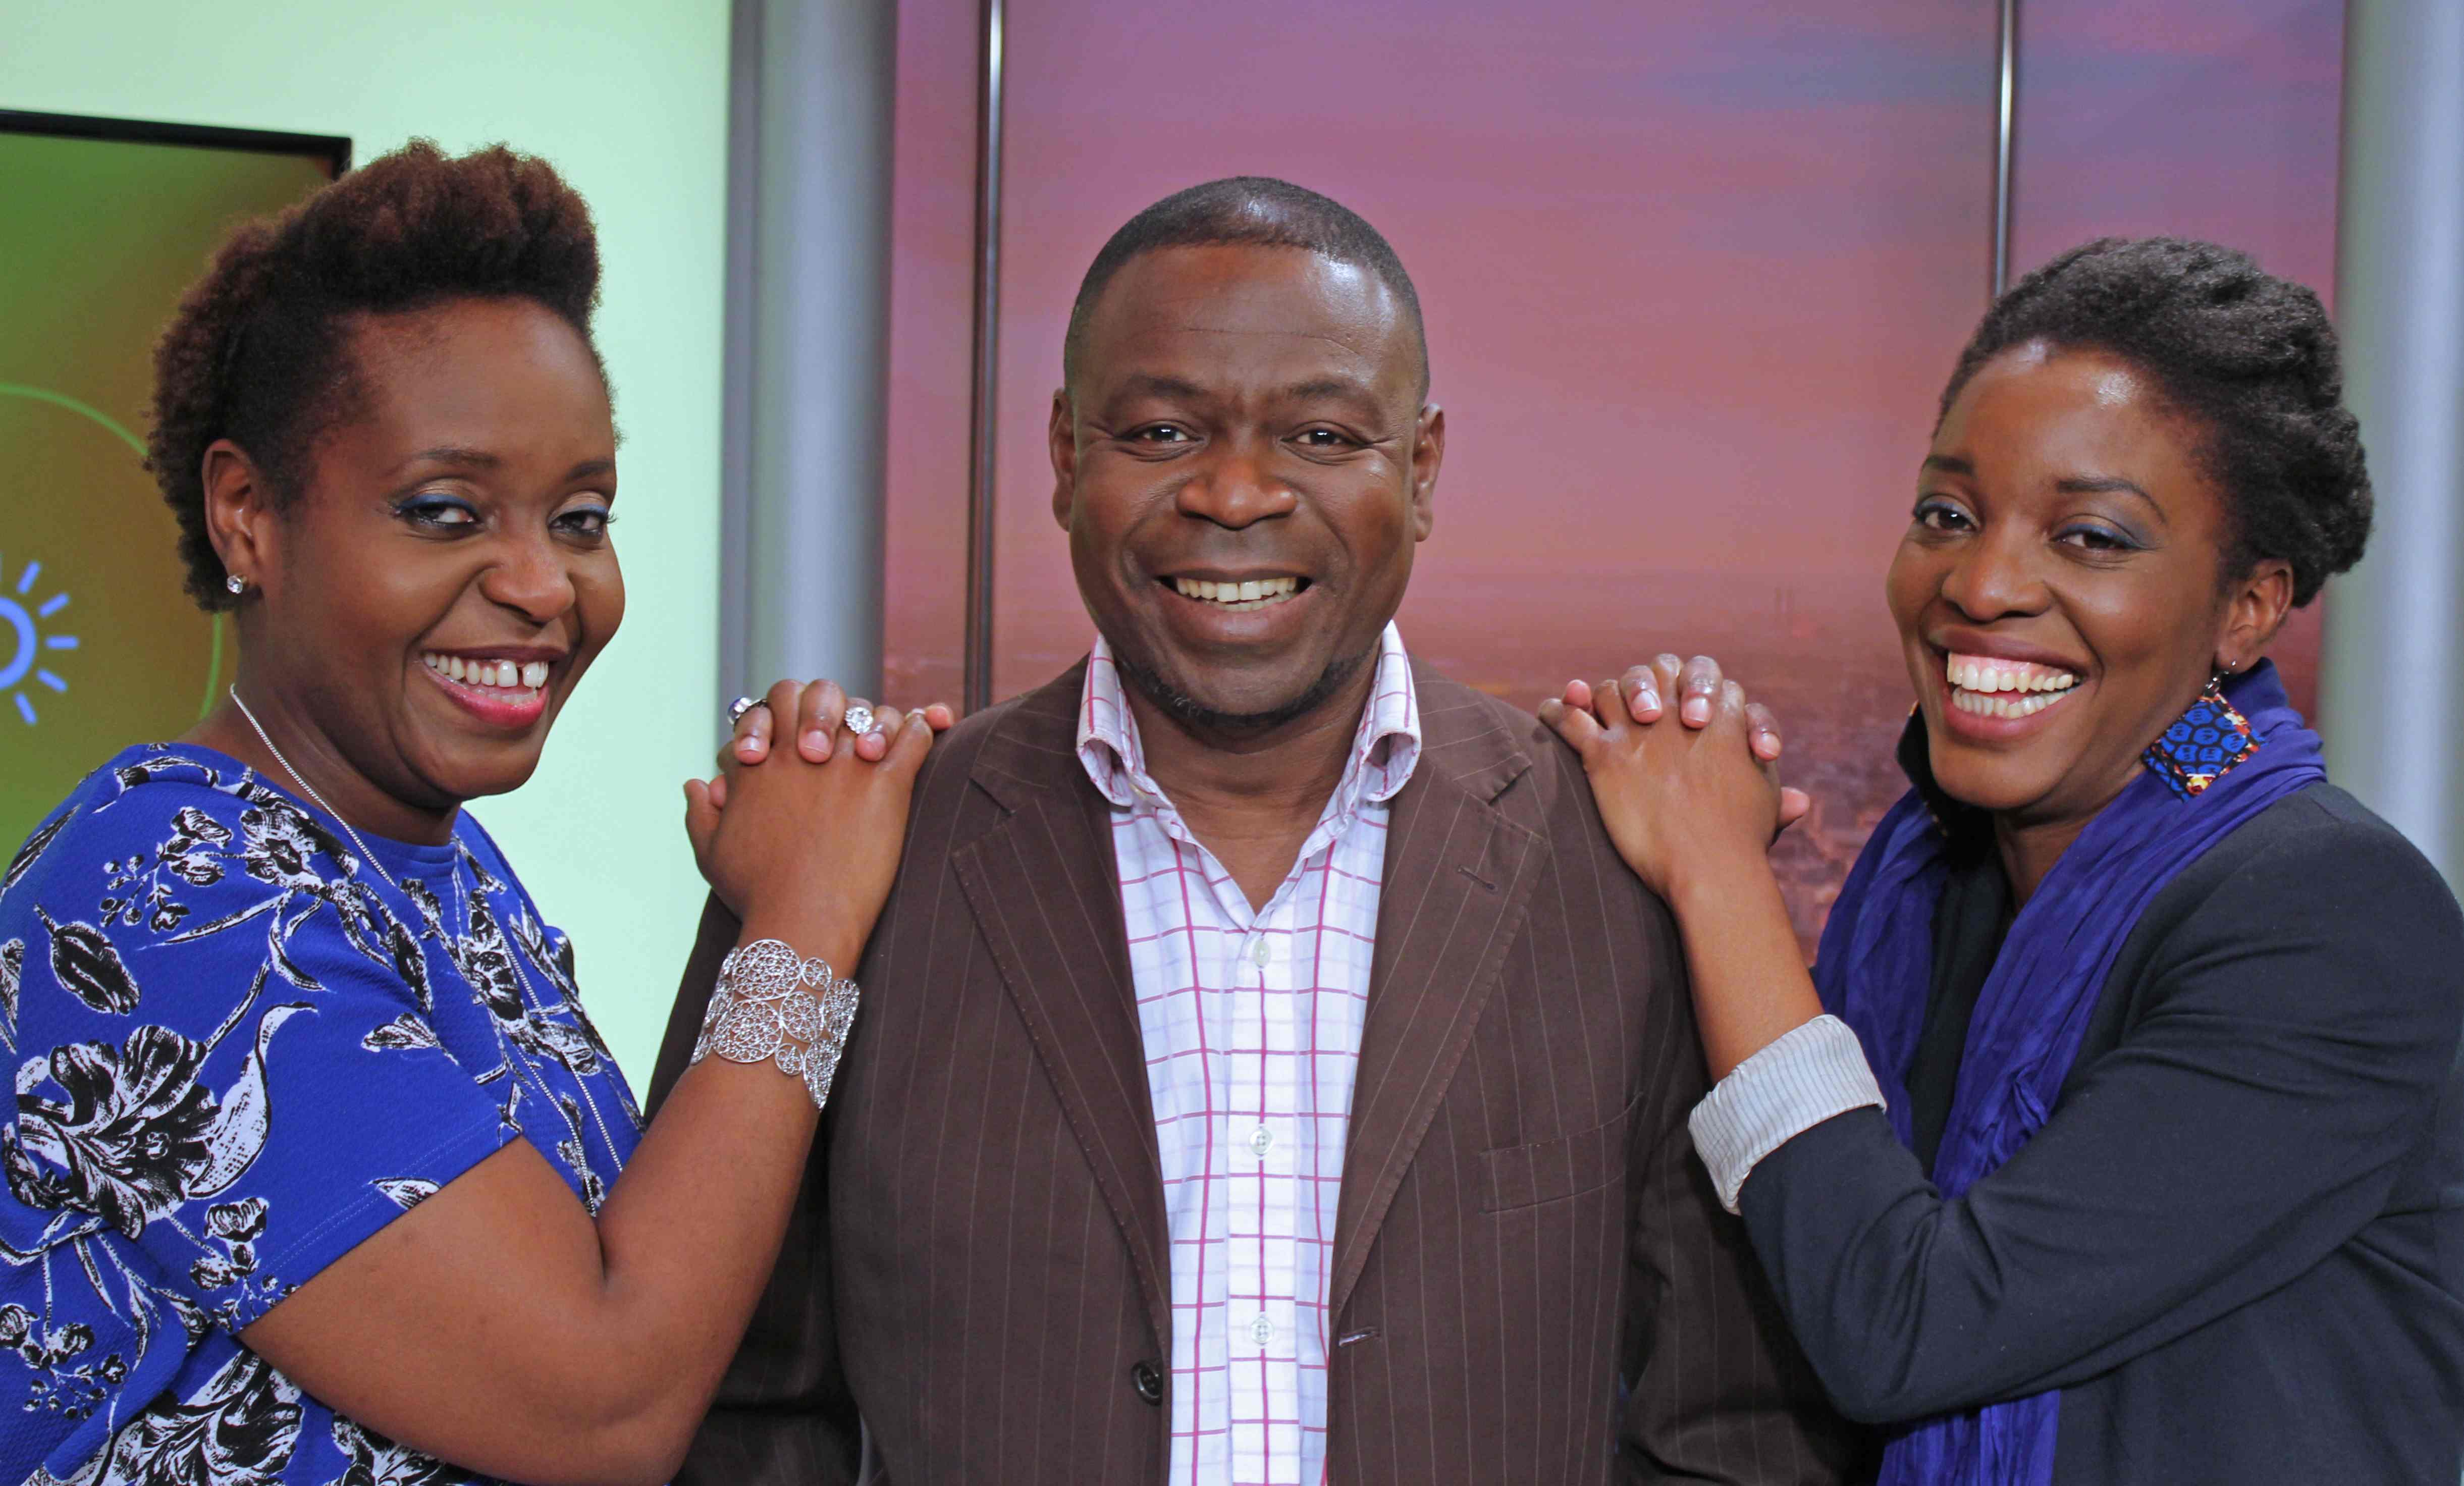 2L ambiance voxafrika chroniqueuse beaute tv